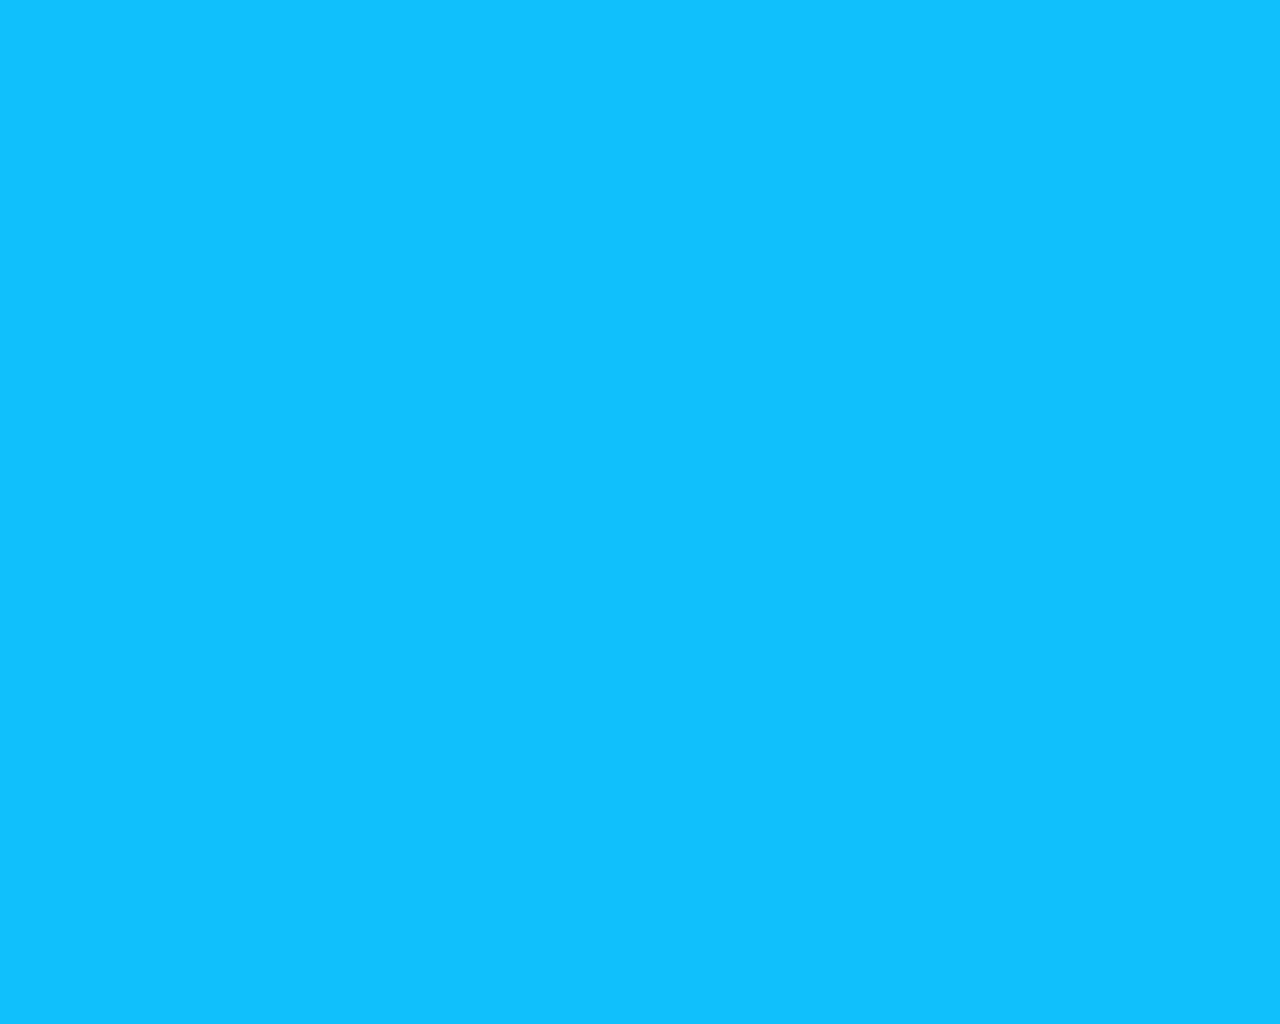 1280x1024 Spiro Disco Ball Solid Color Background